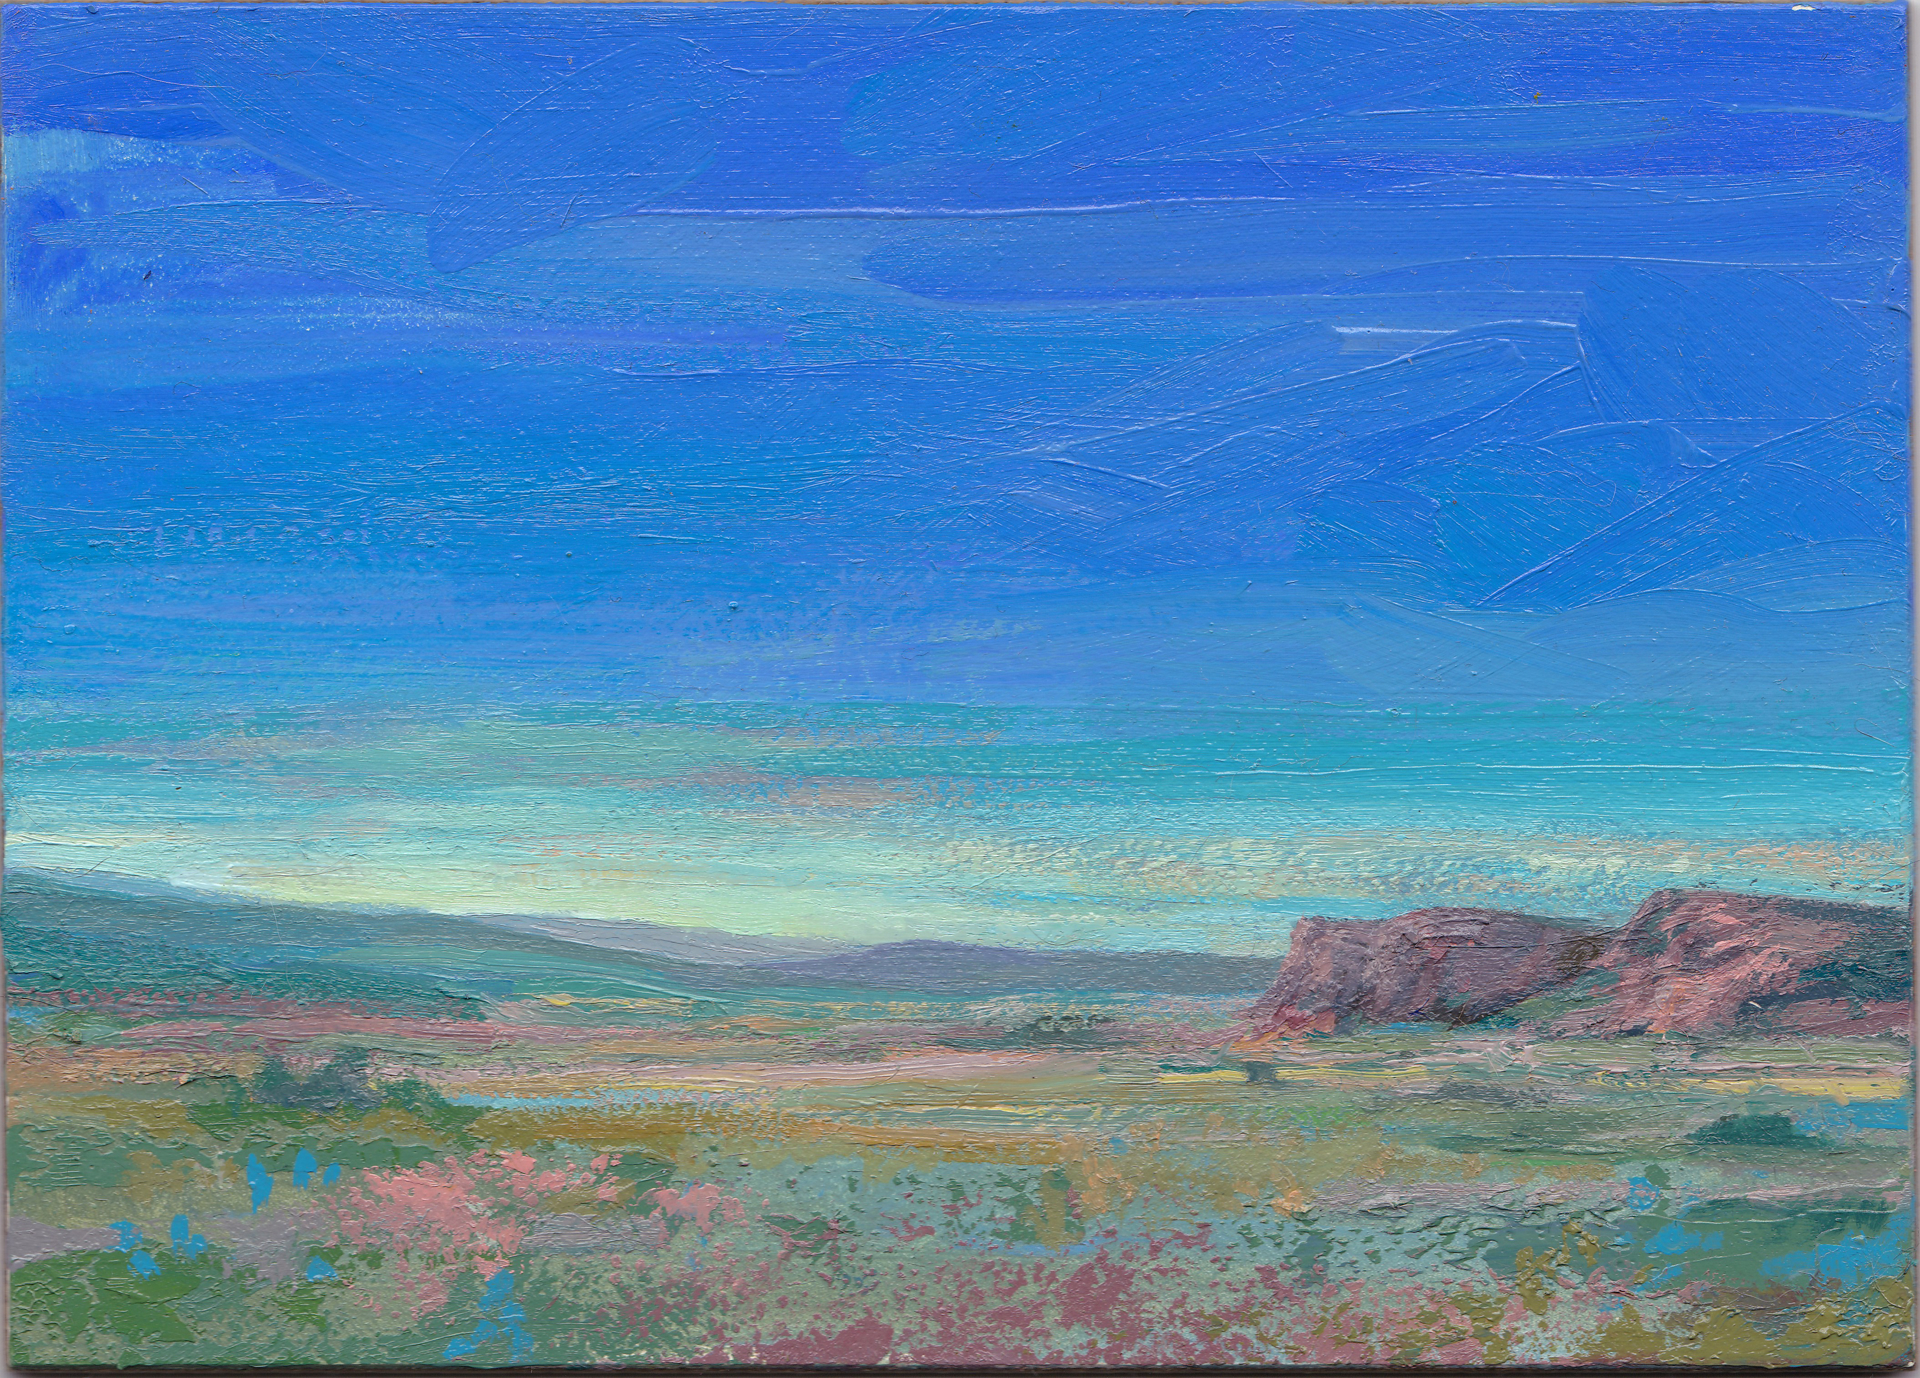 Skyline - Afternoon by Charis Carmichael Braun